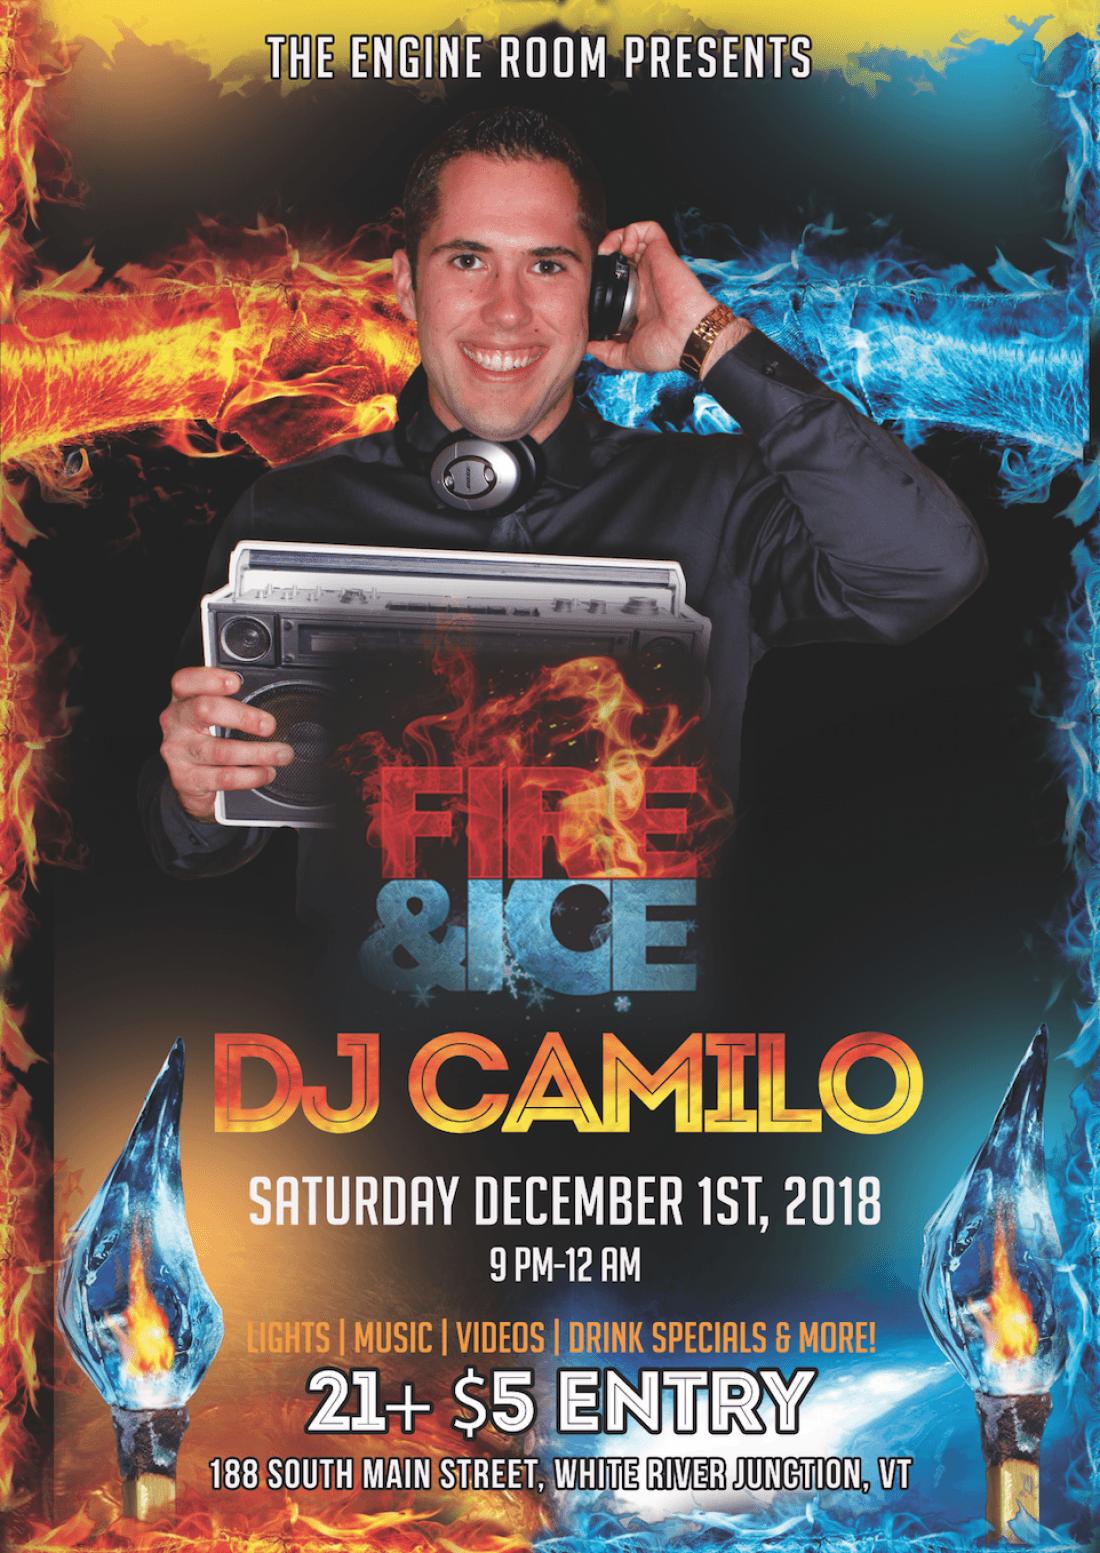 "The Engine Room Wrj Vt: The Engine Room Presents ""Fire & Ice"" Featuring DJ Camilo"